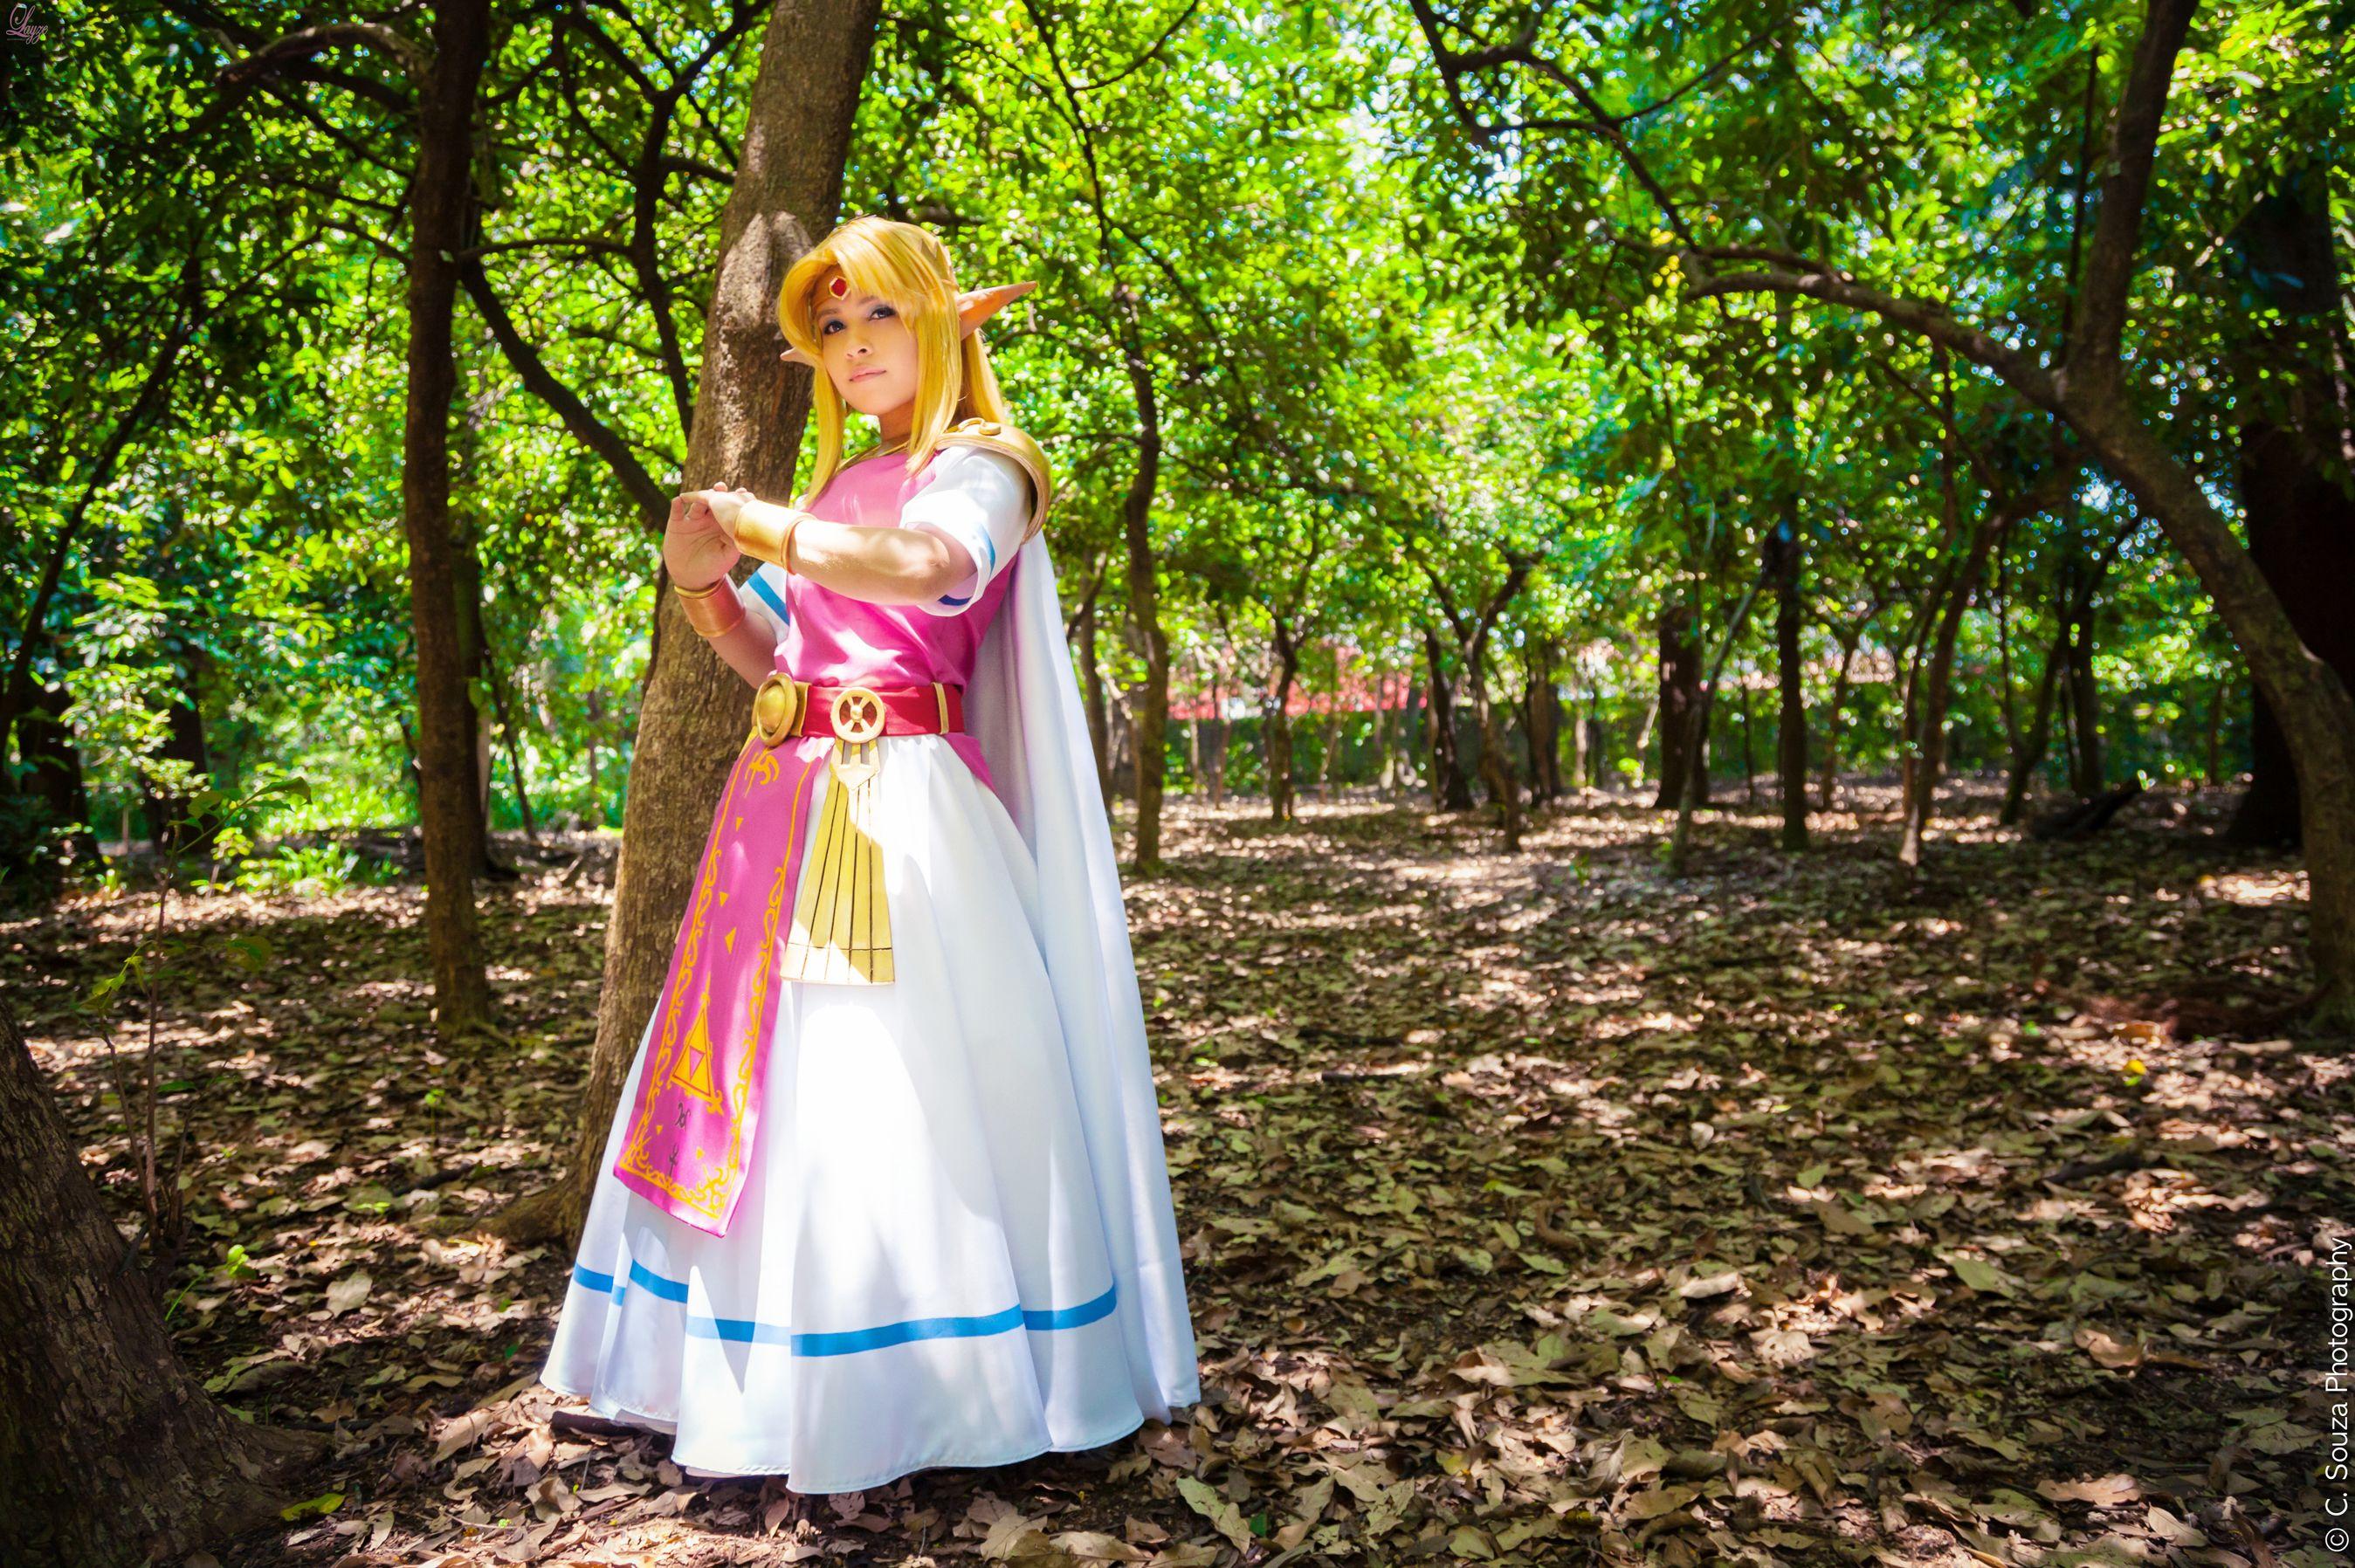 Princess Zelda Cosplay A Link Between Worlds By Laahmichelle